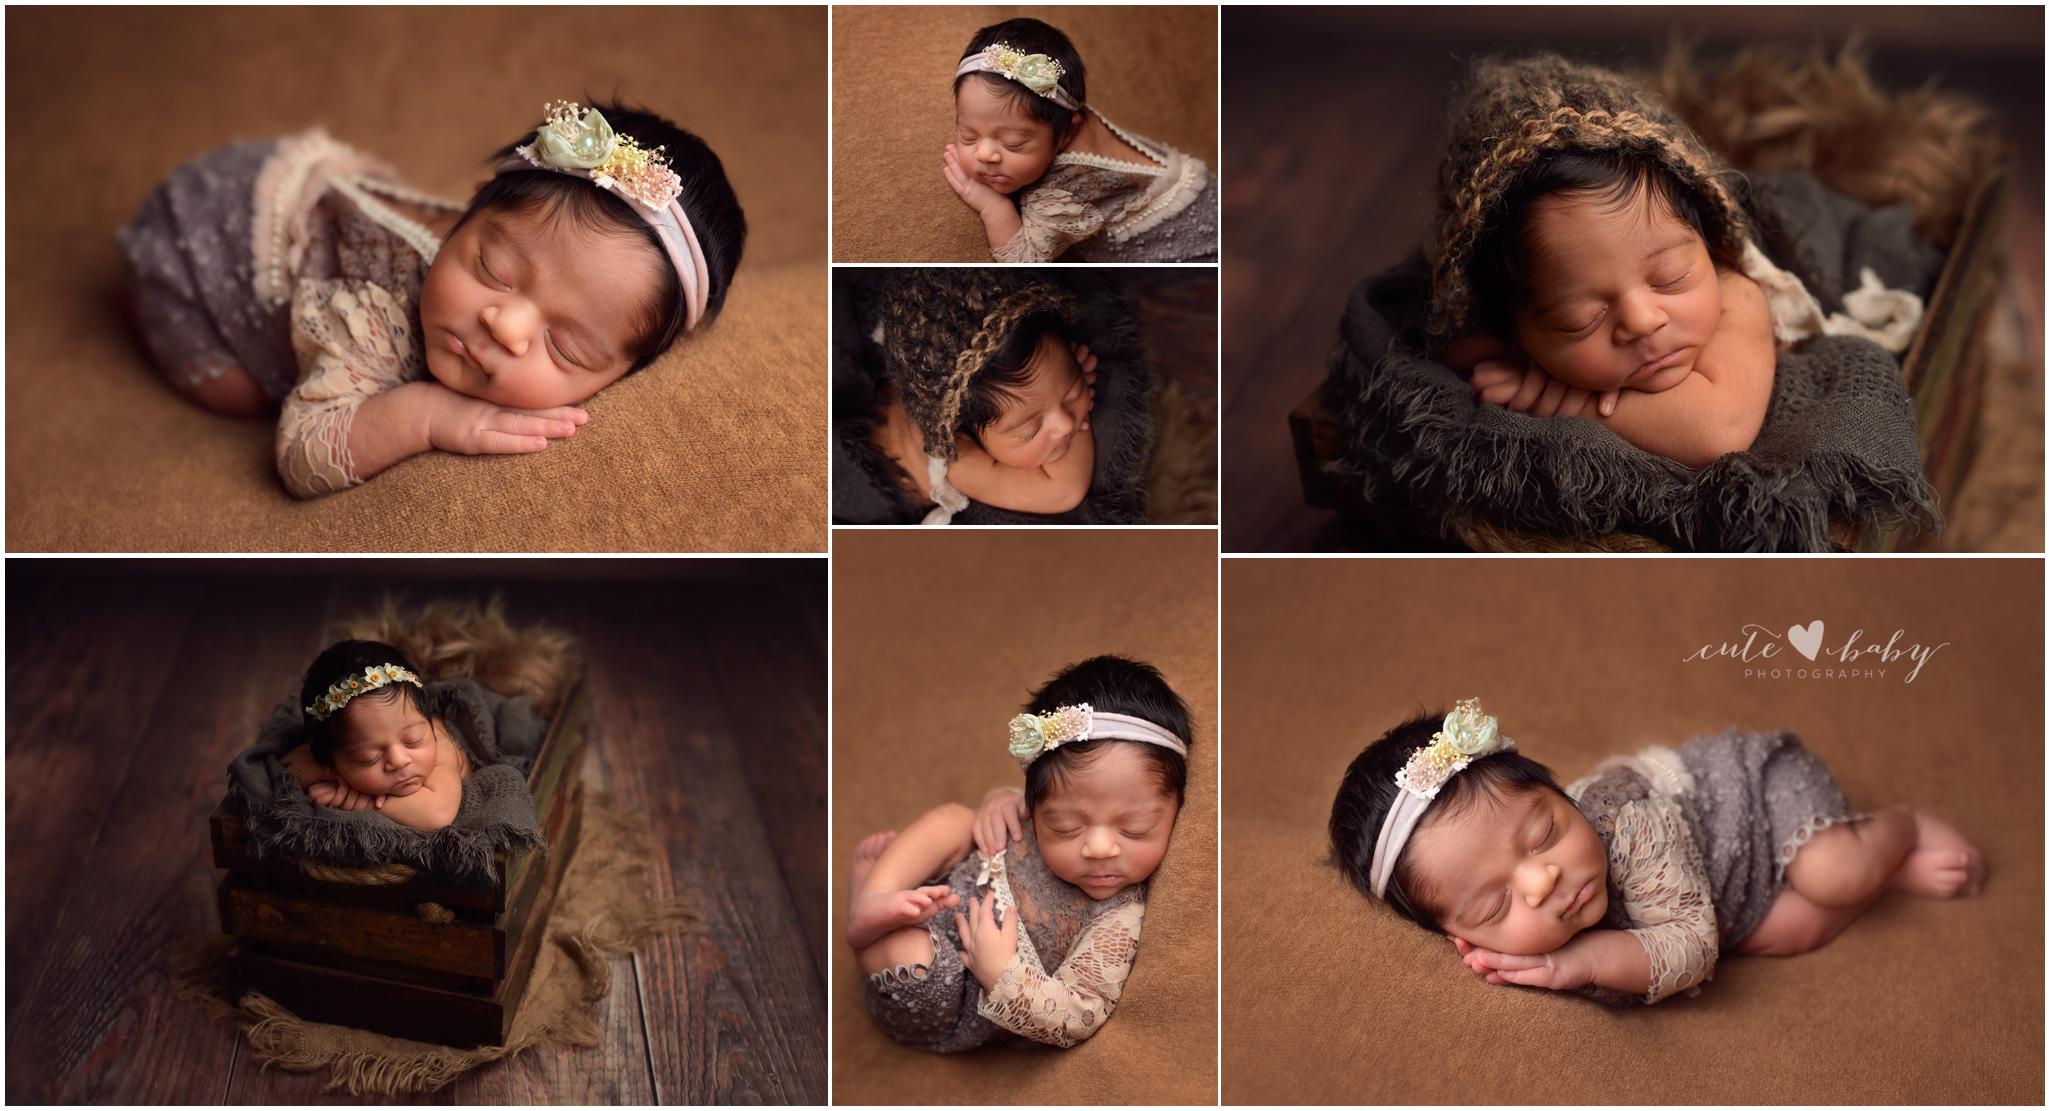 Newborn Photography Manchester, Newborn Pictures Cheshire, Baby portraits Tameside, Ashton under Lyne Newborn Photographer